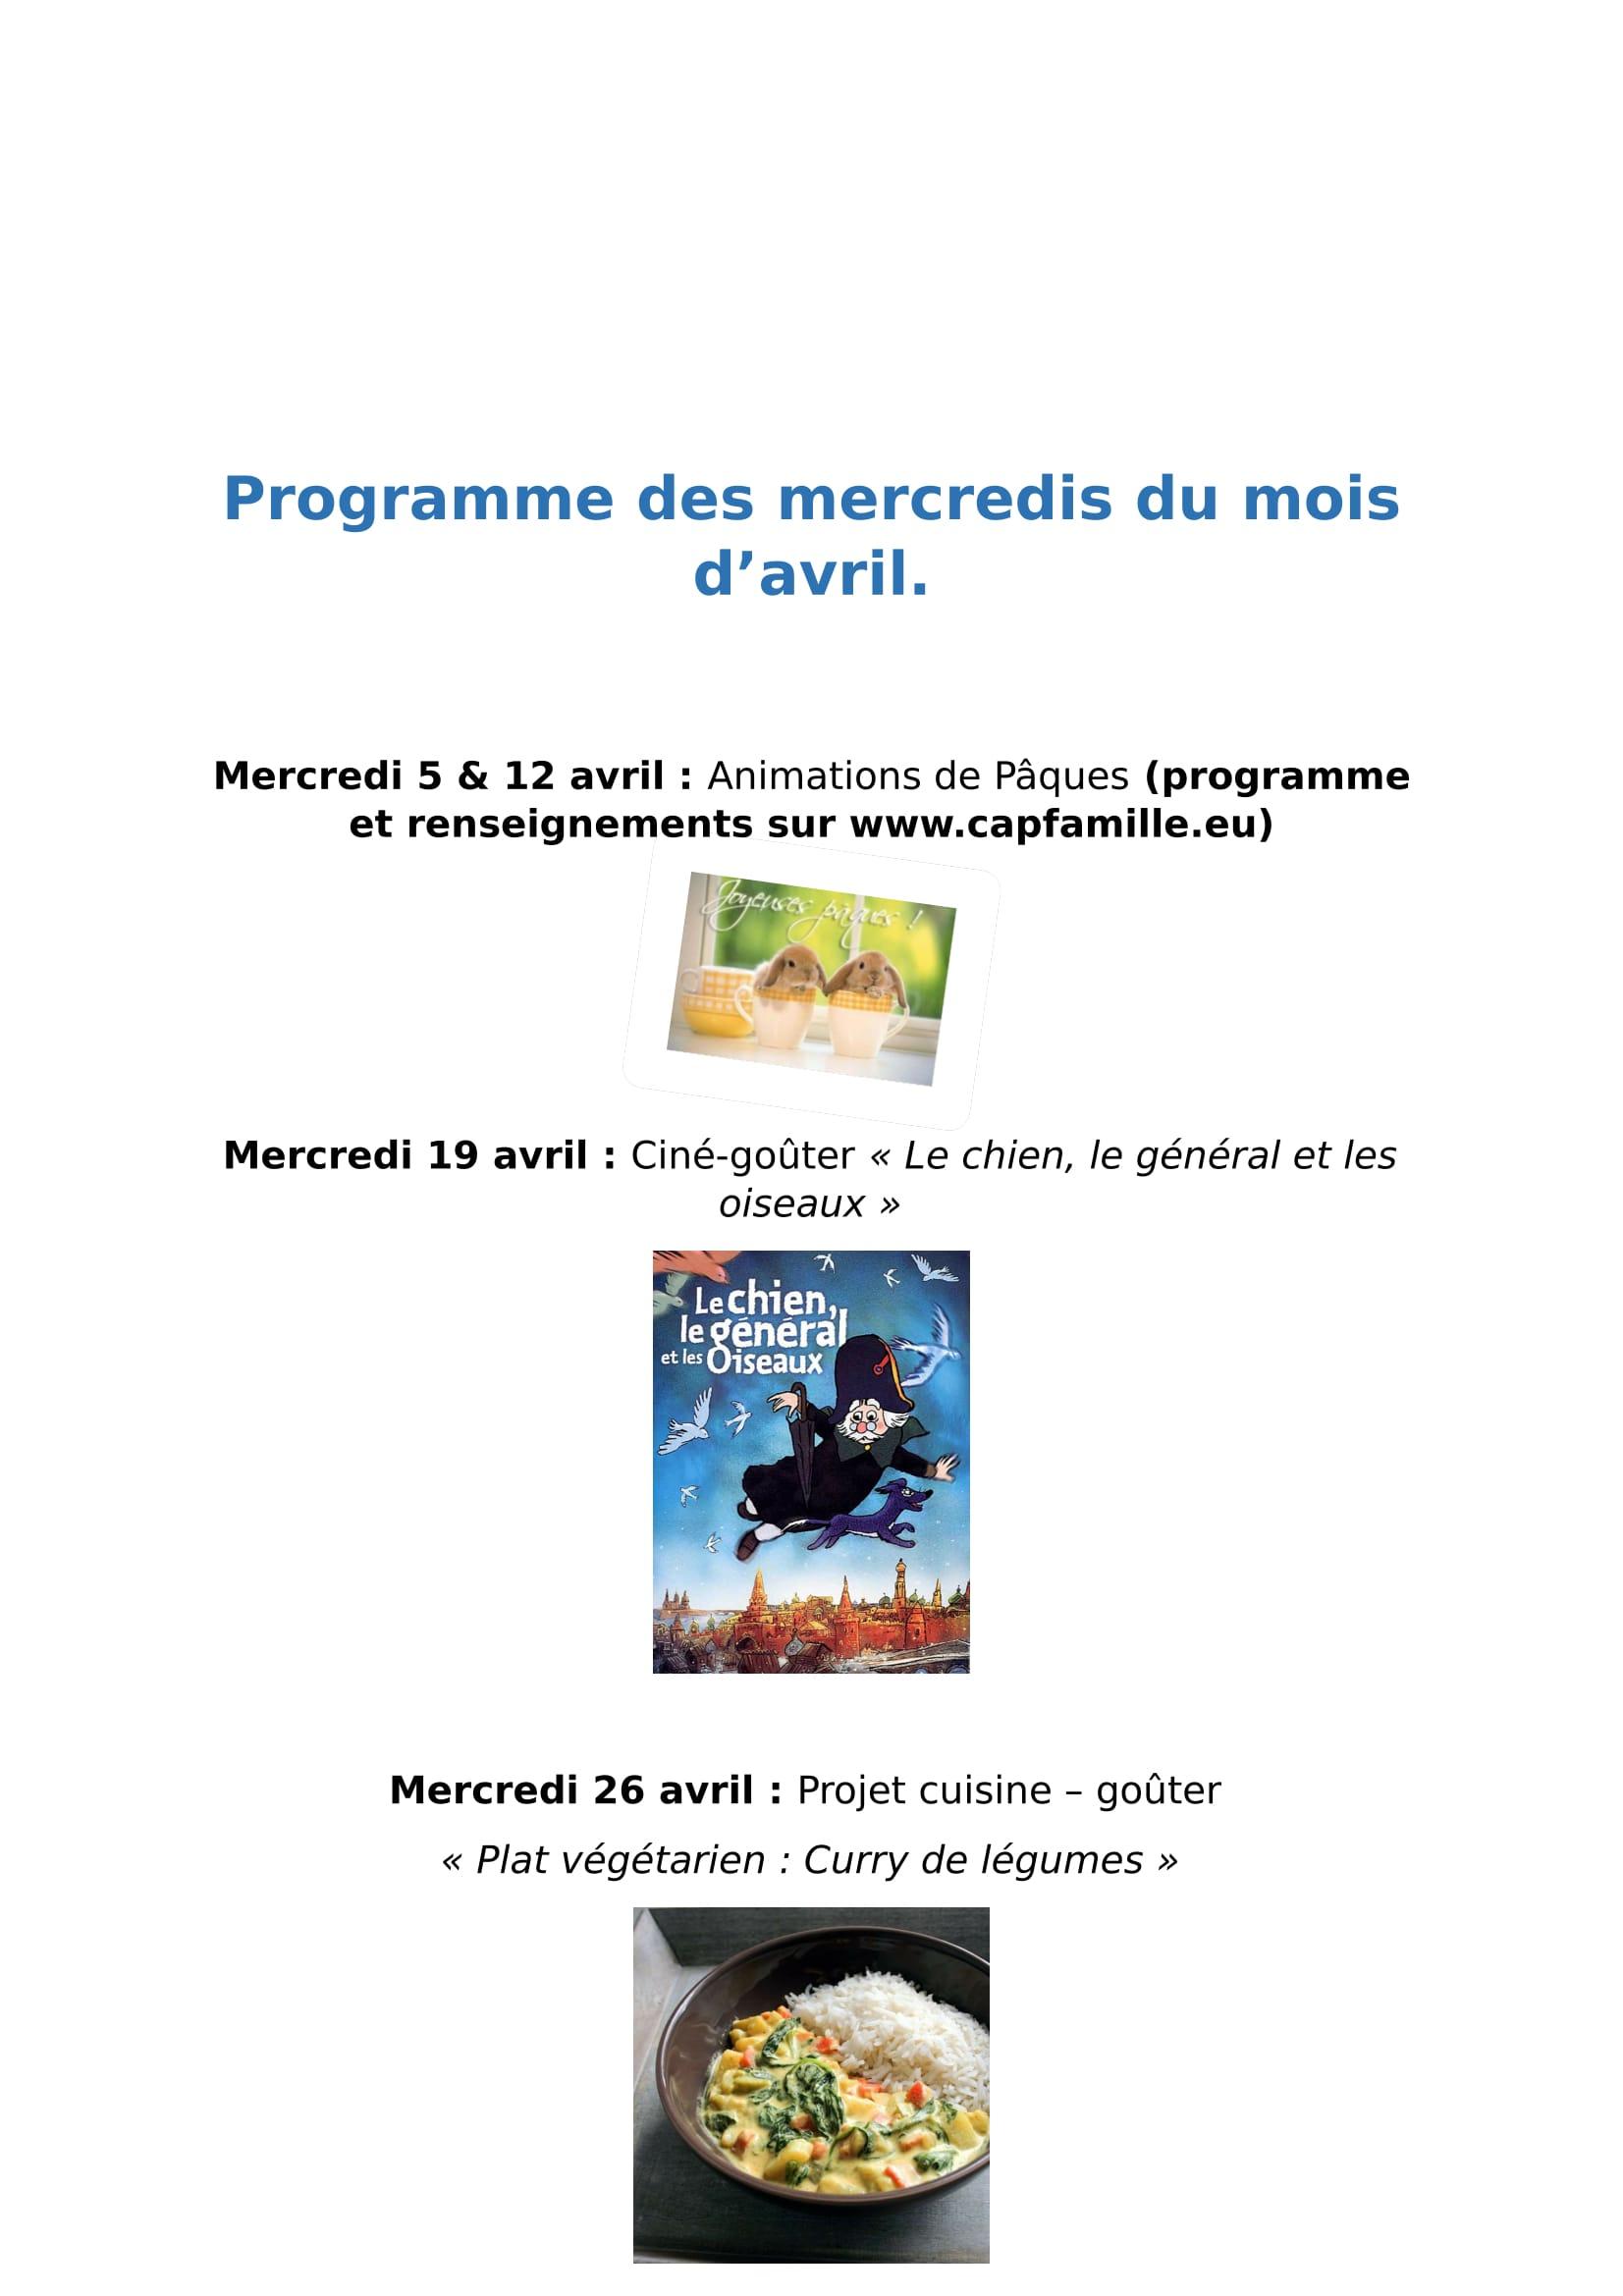 programme des mercredis d'avril 2017 (1)-1